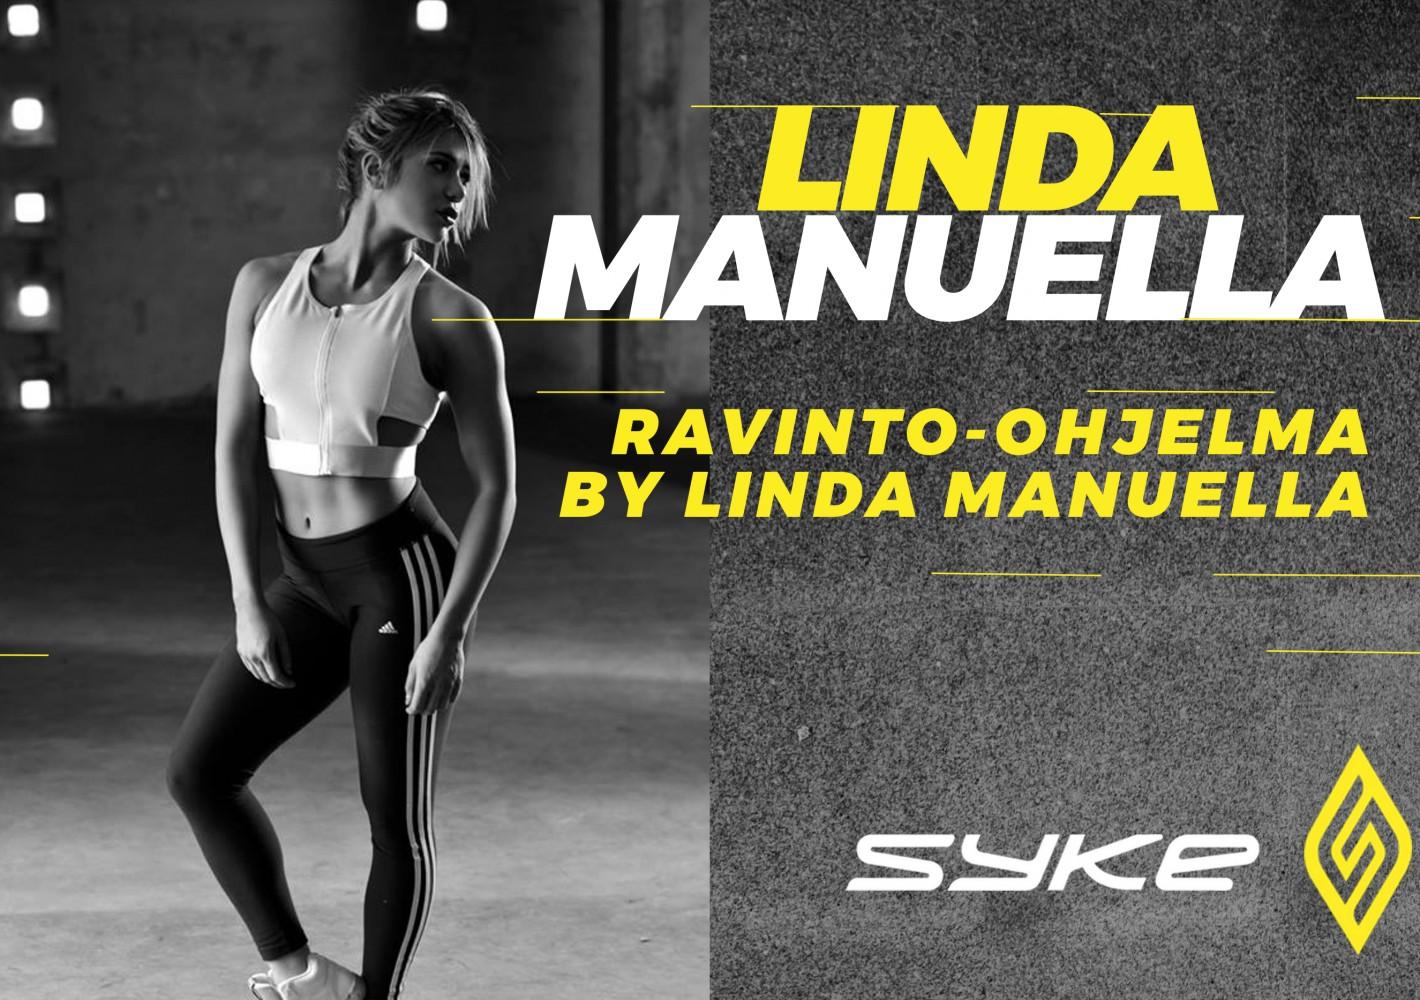 Ravinto-ohjelma by Linda Manuella